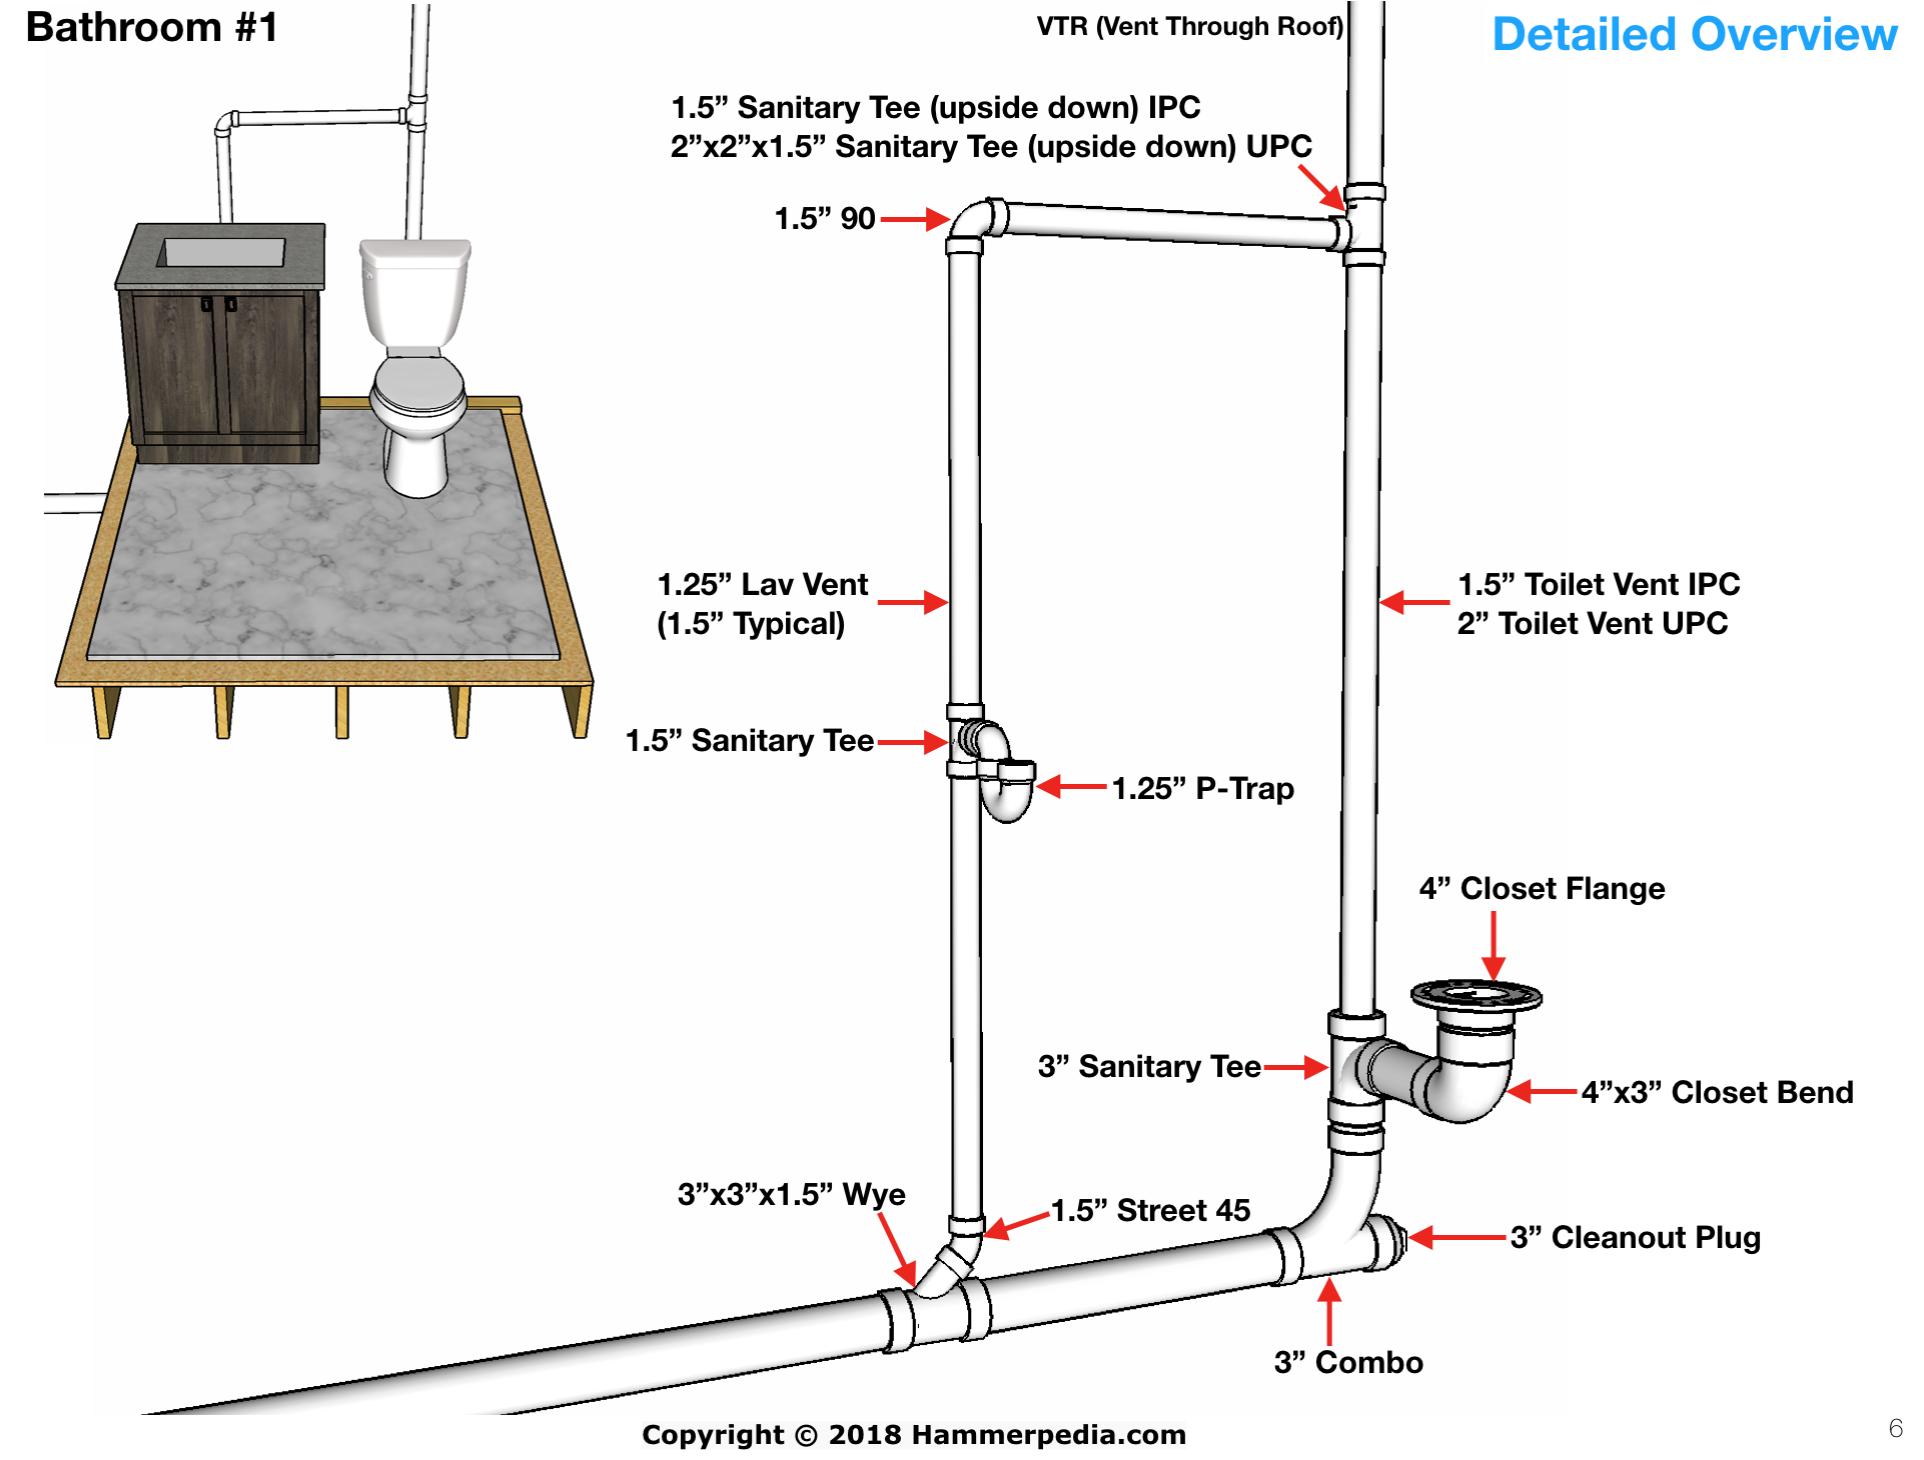 Hammerpedia Bathroom Plumbing Bathroom Construction Plumbing Installation